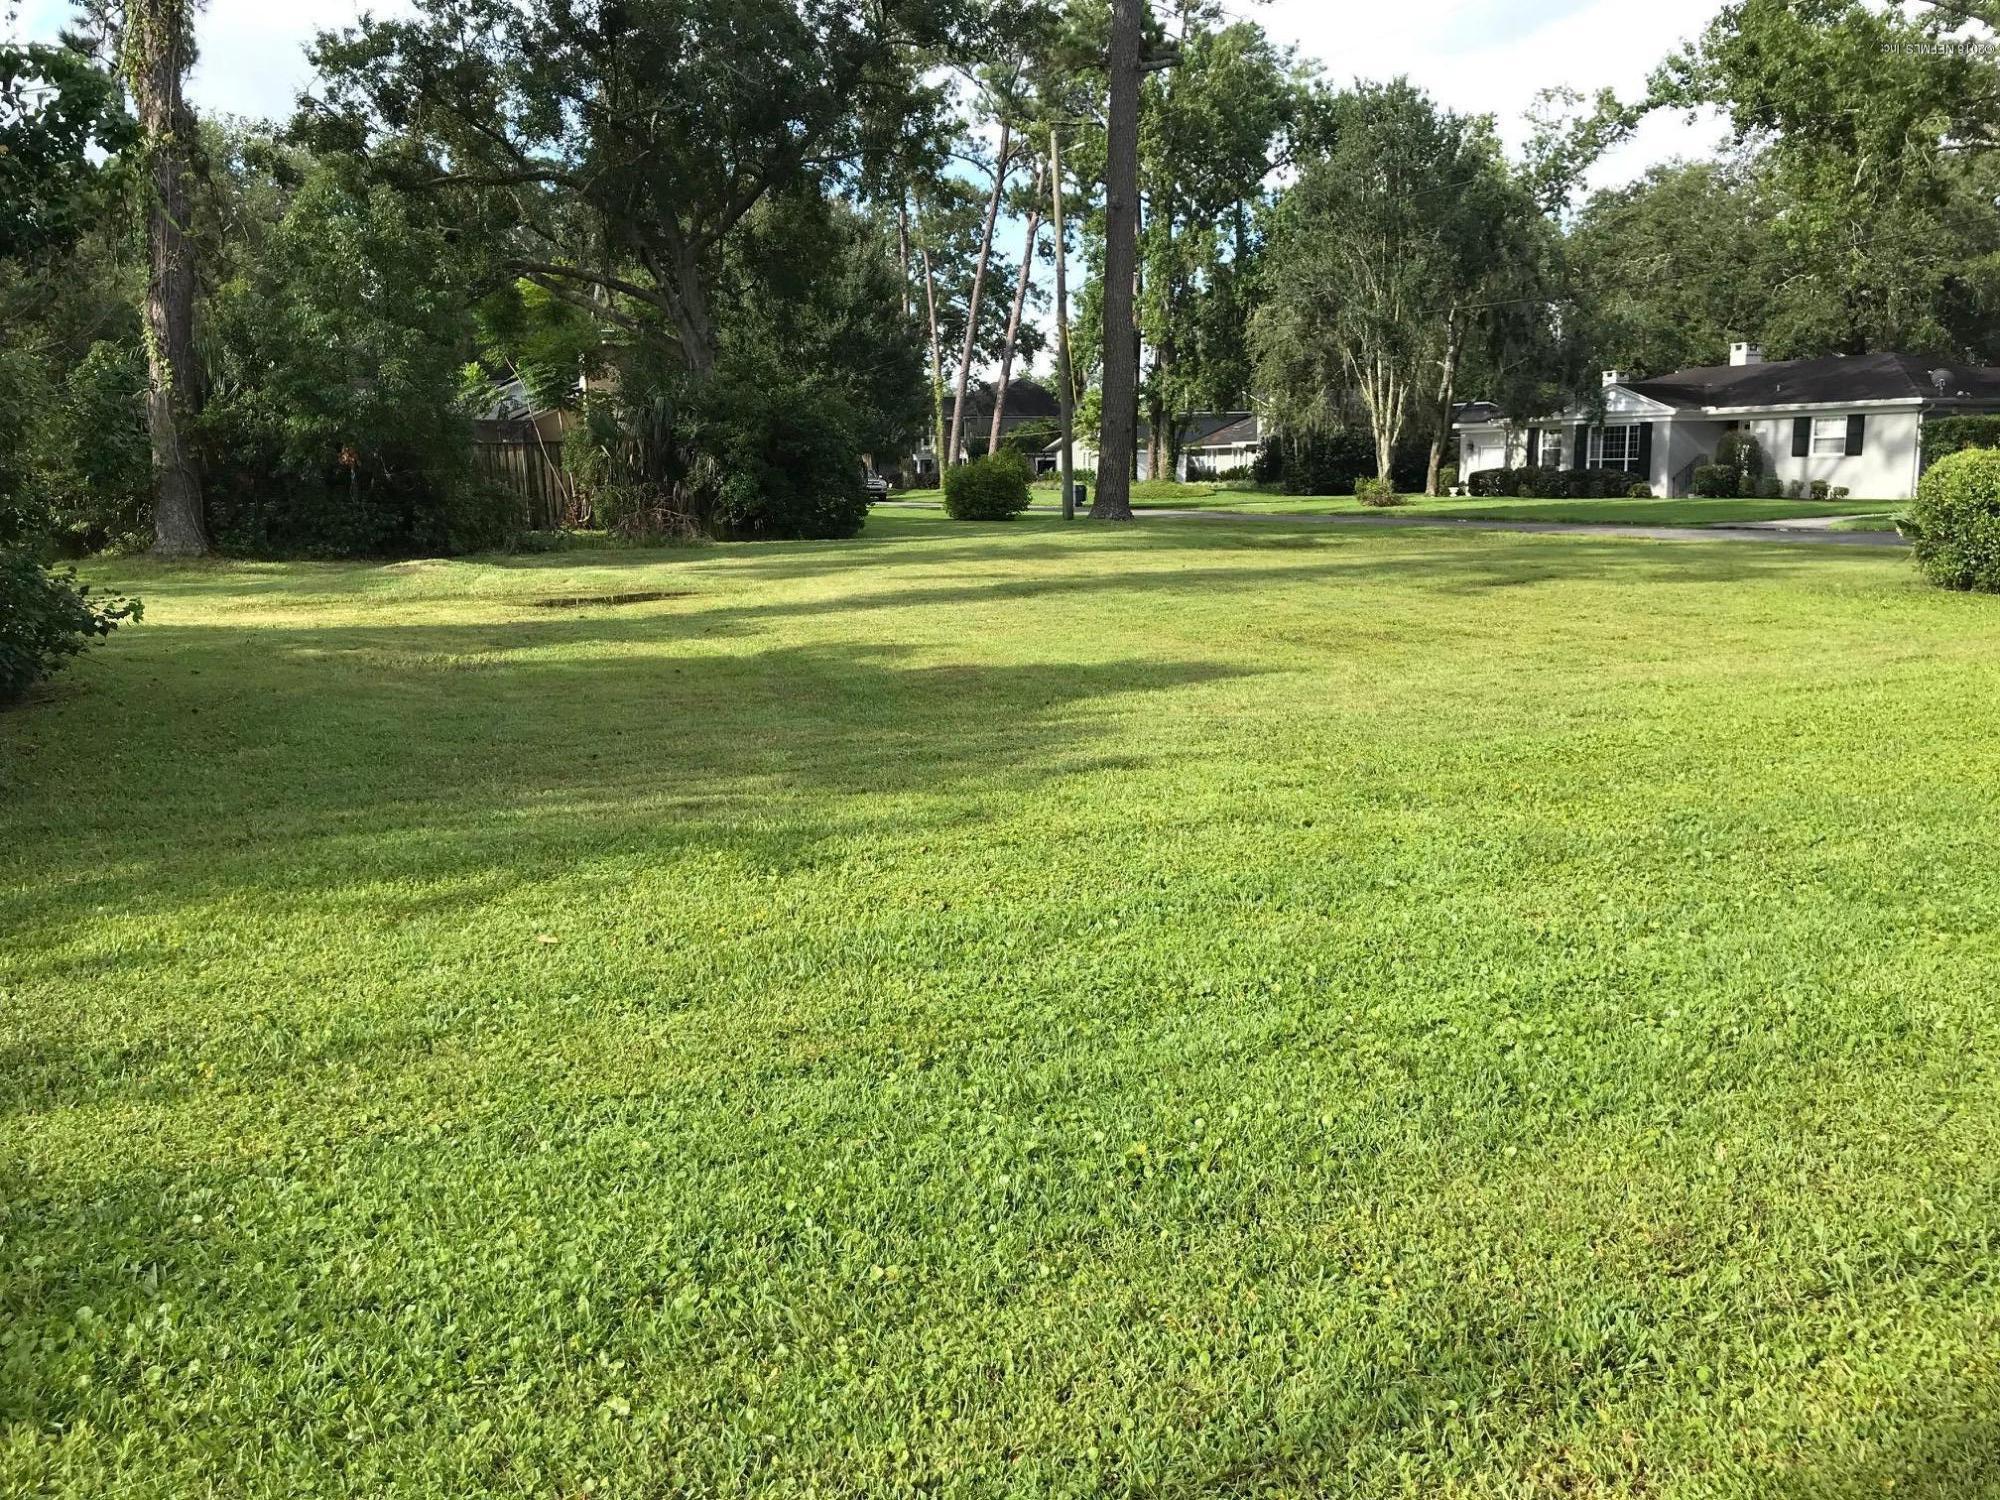 0 ARAPAHOE, JACKSONVILLE, FLORIDA 32210, ,Vacant land,For sale,ARAPAHOE,945688